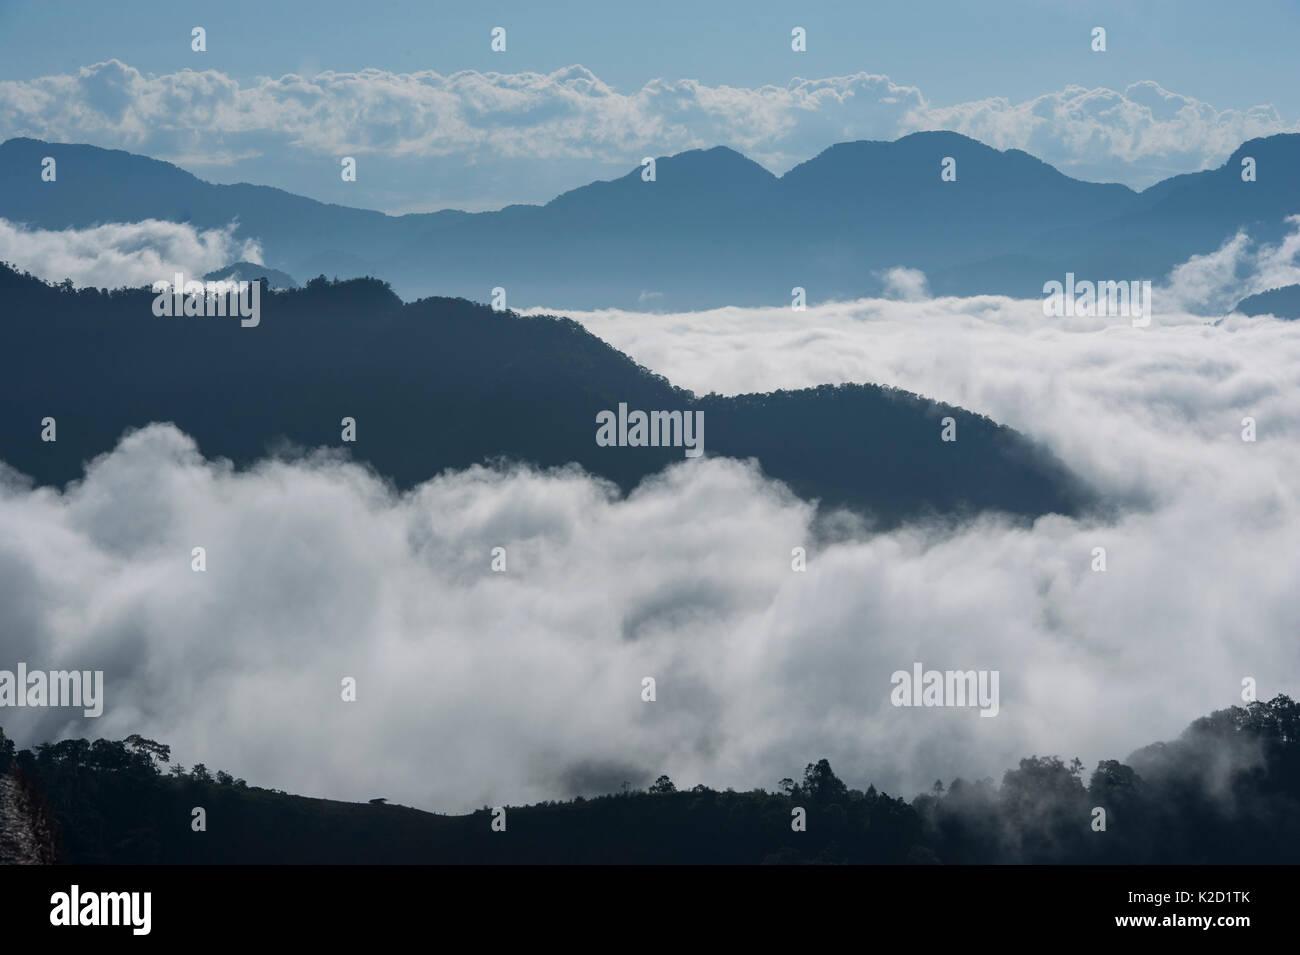 Himalayan foothills scenic, Arunachal Pradesh, North East India, November 2014. - Stock Image